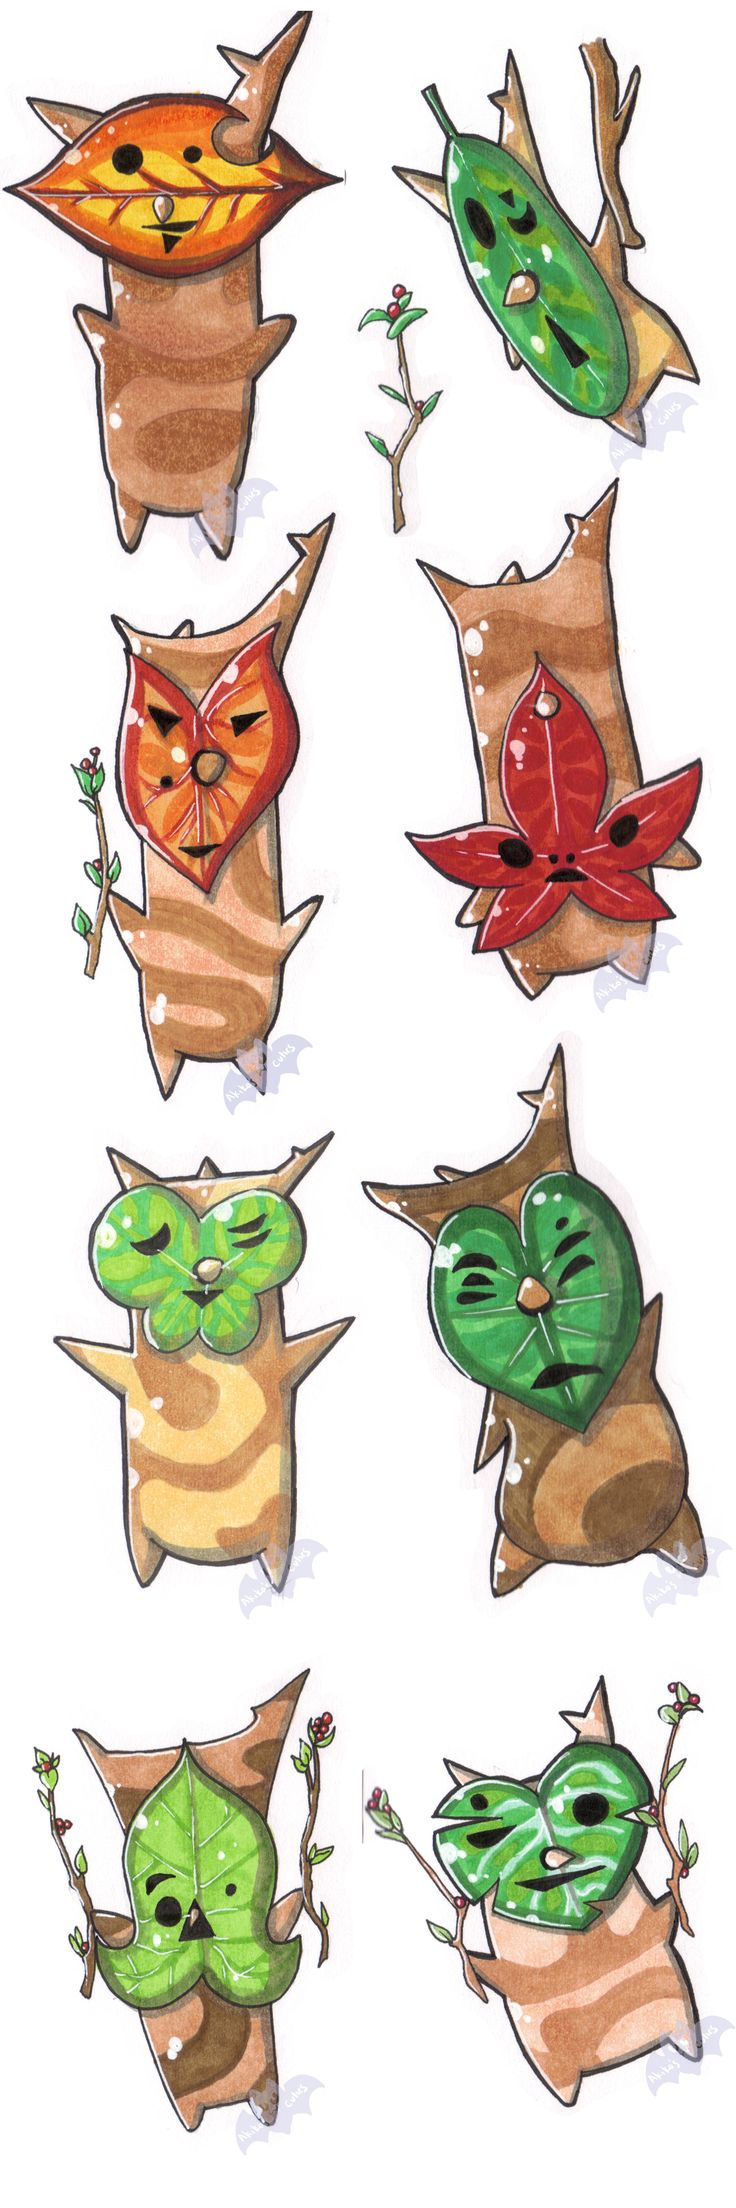 Korok Sketch Dump by AkikoKaido http://www.deviantart.com/art/Korok-Sketchbook-dump-676772600